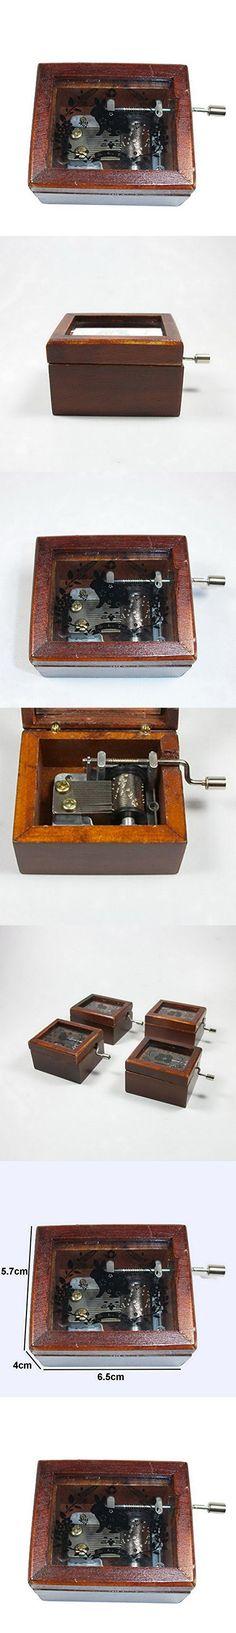 Home Decor Wood Retro Fashion Mini Wooden Hand Crank Music Box Creative Gift Music Box Rabbit